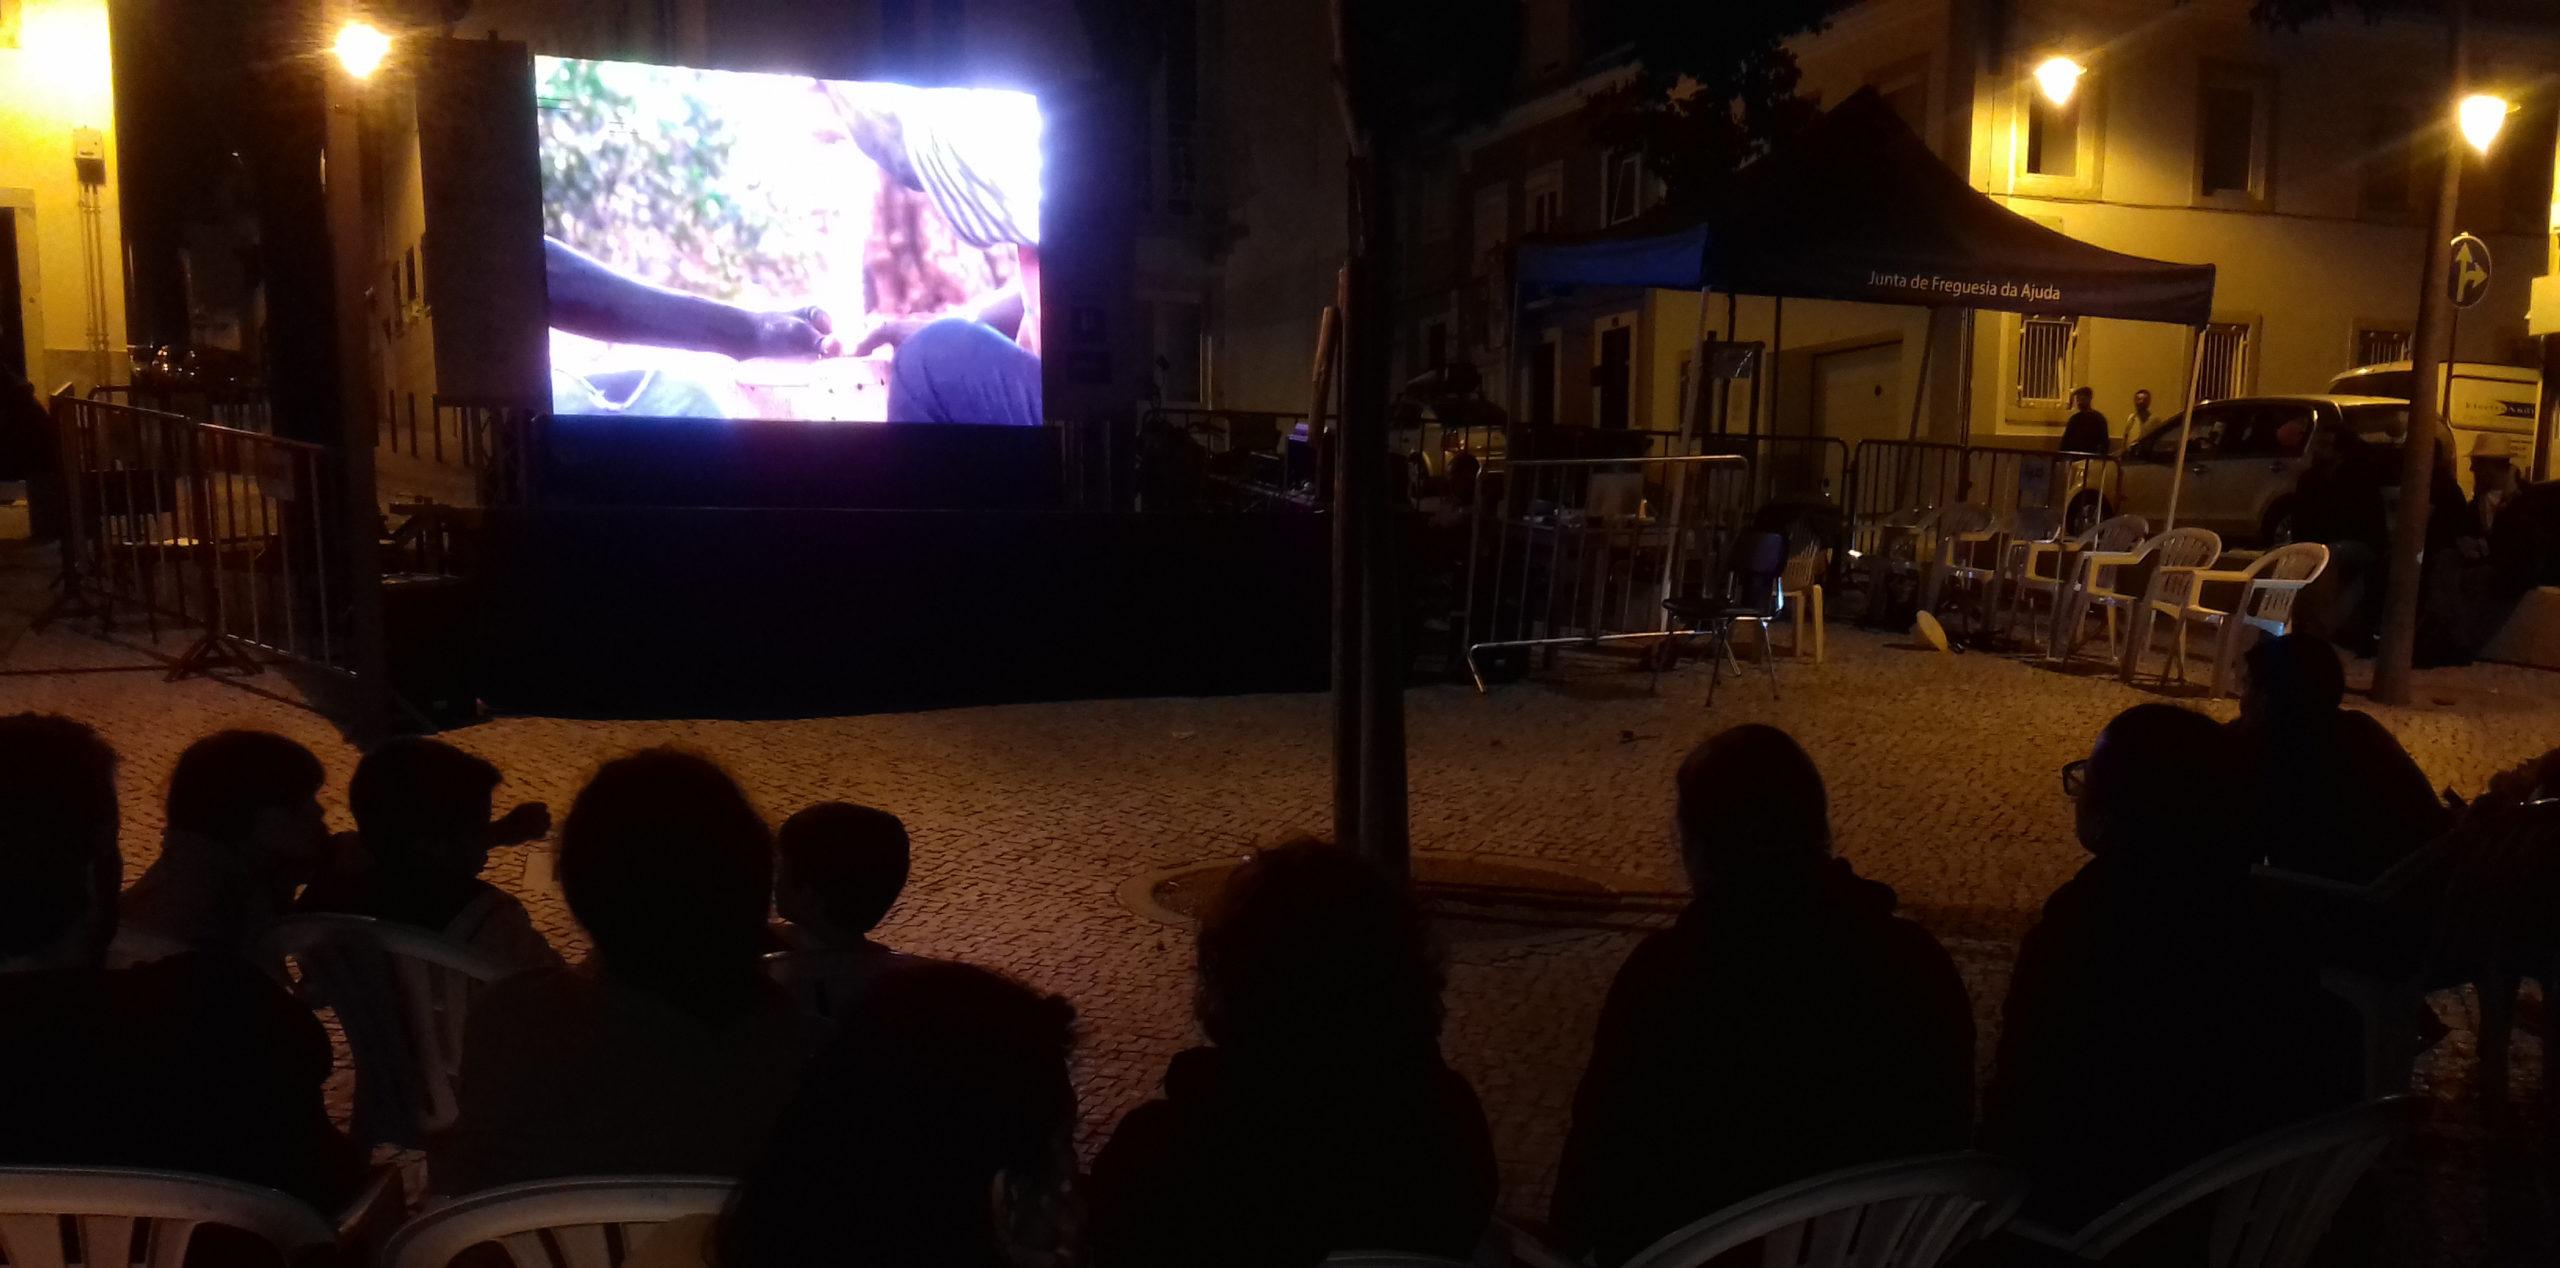 Heritales - IV International Heritage Film Festival